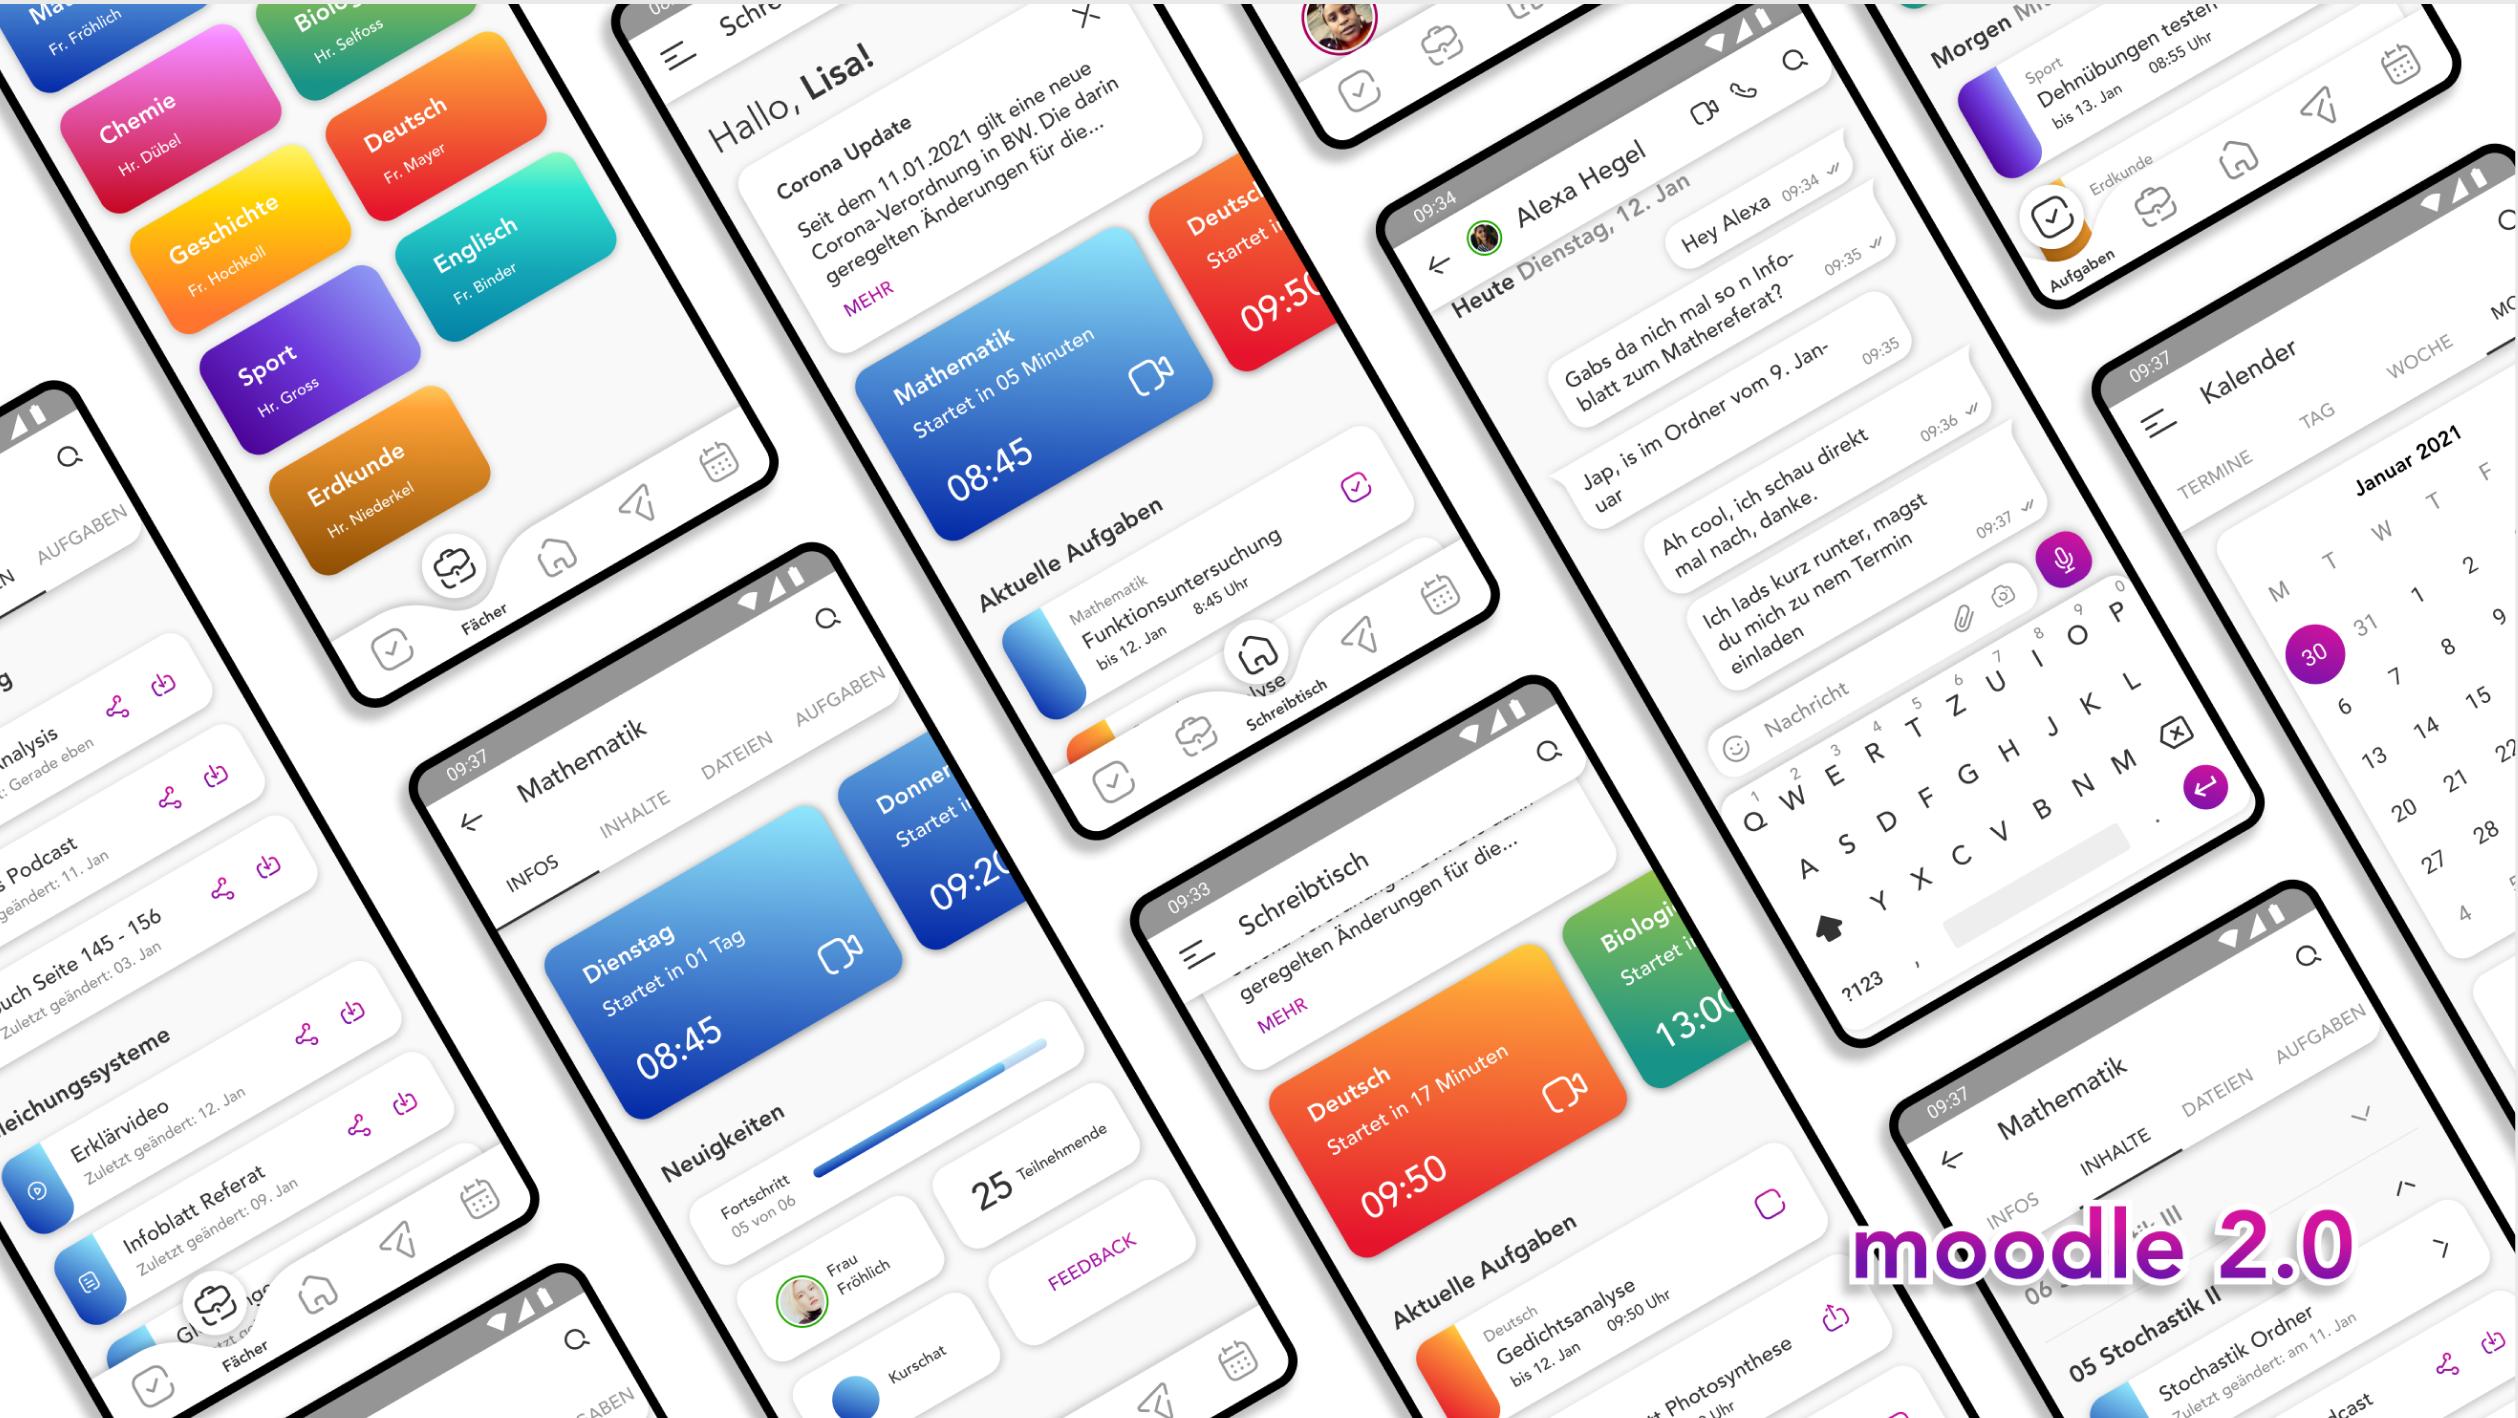 mockup of multiple app-screens